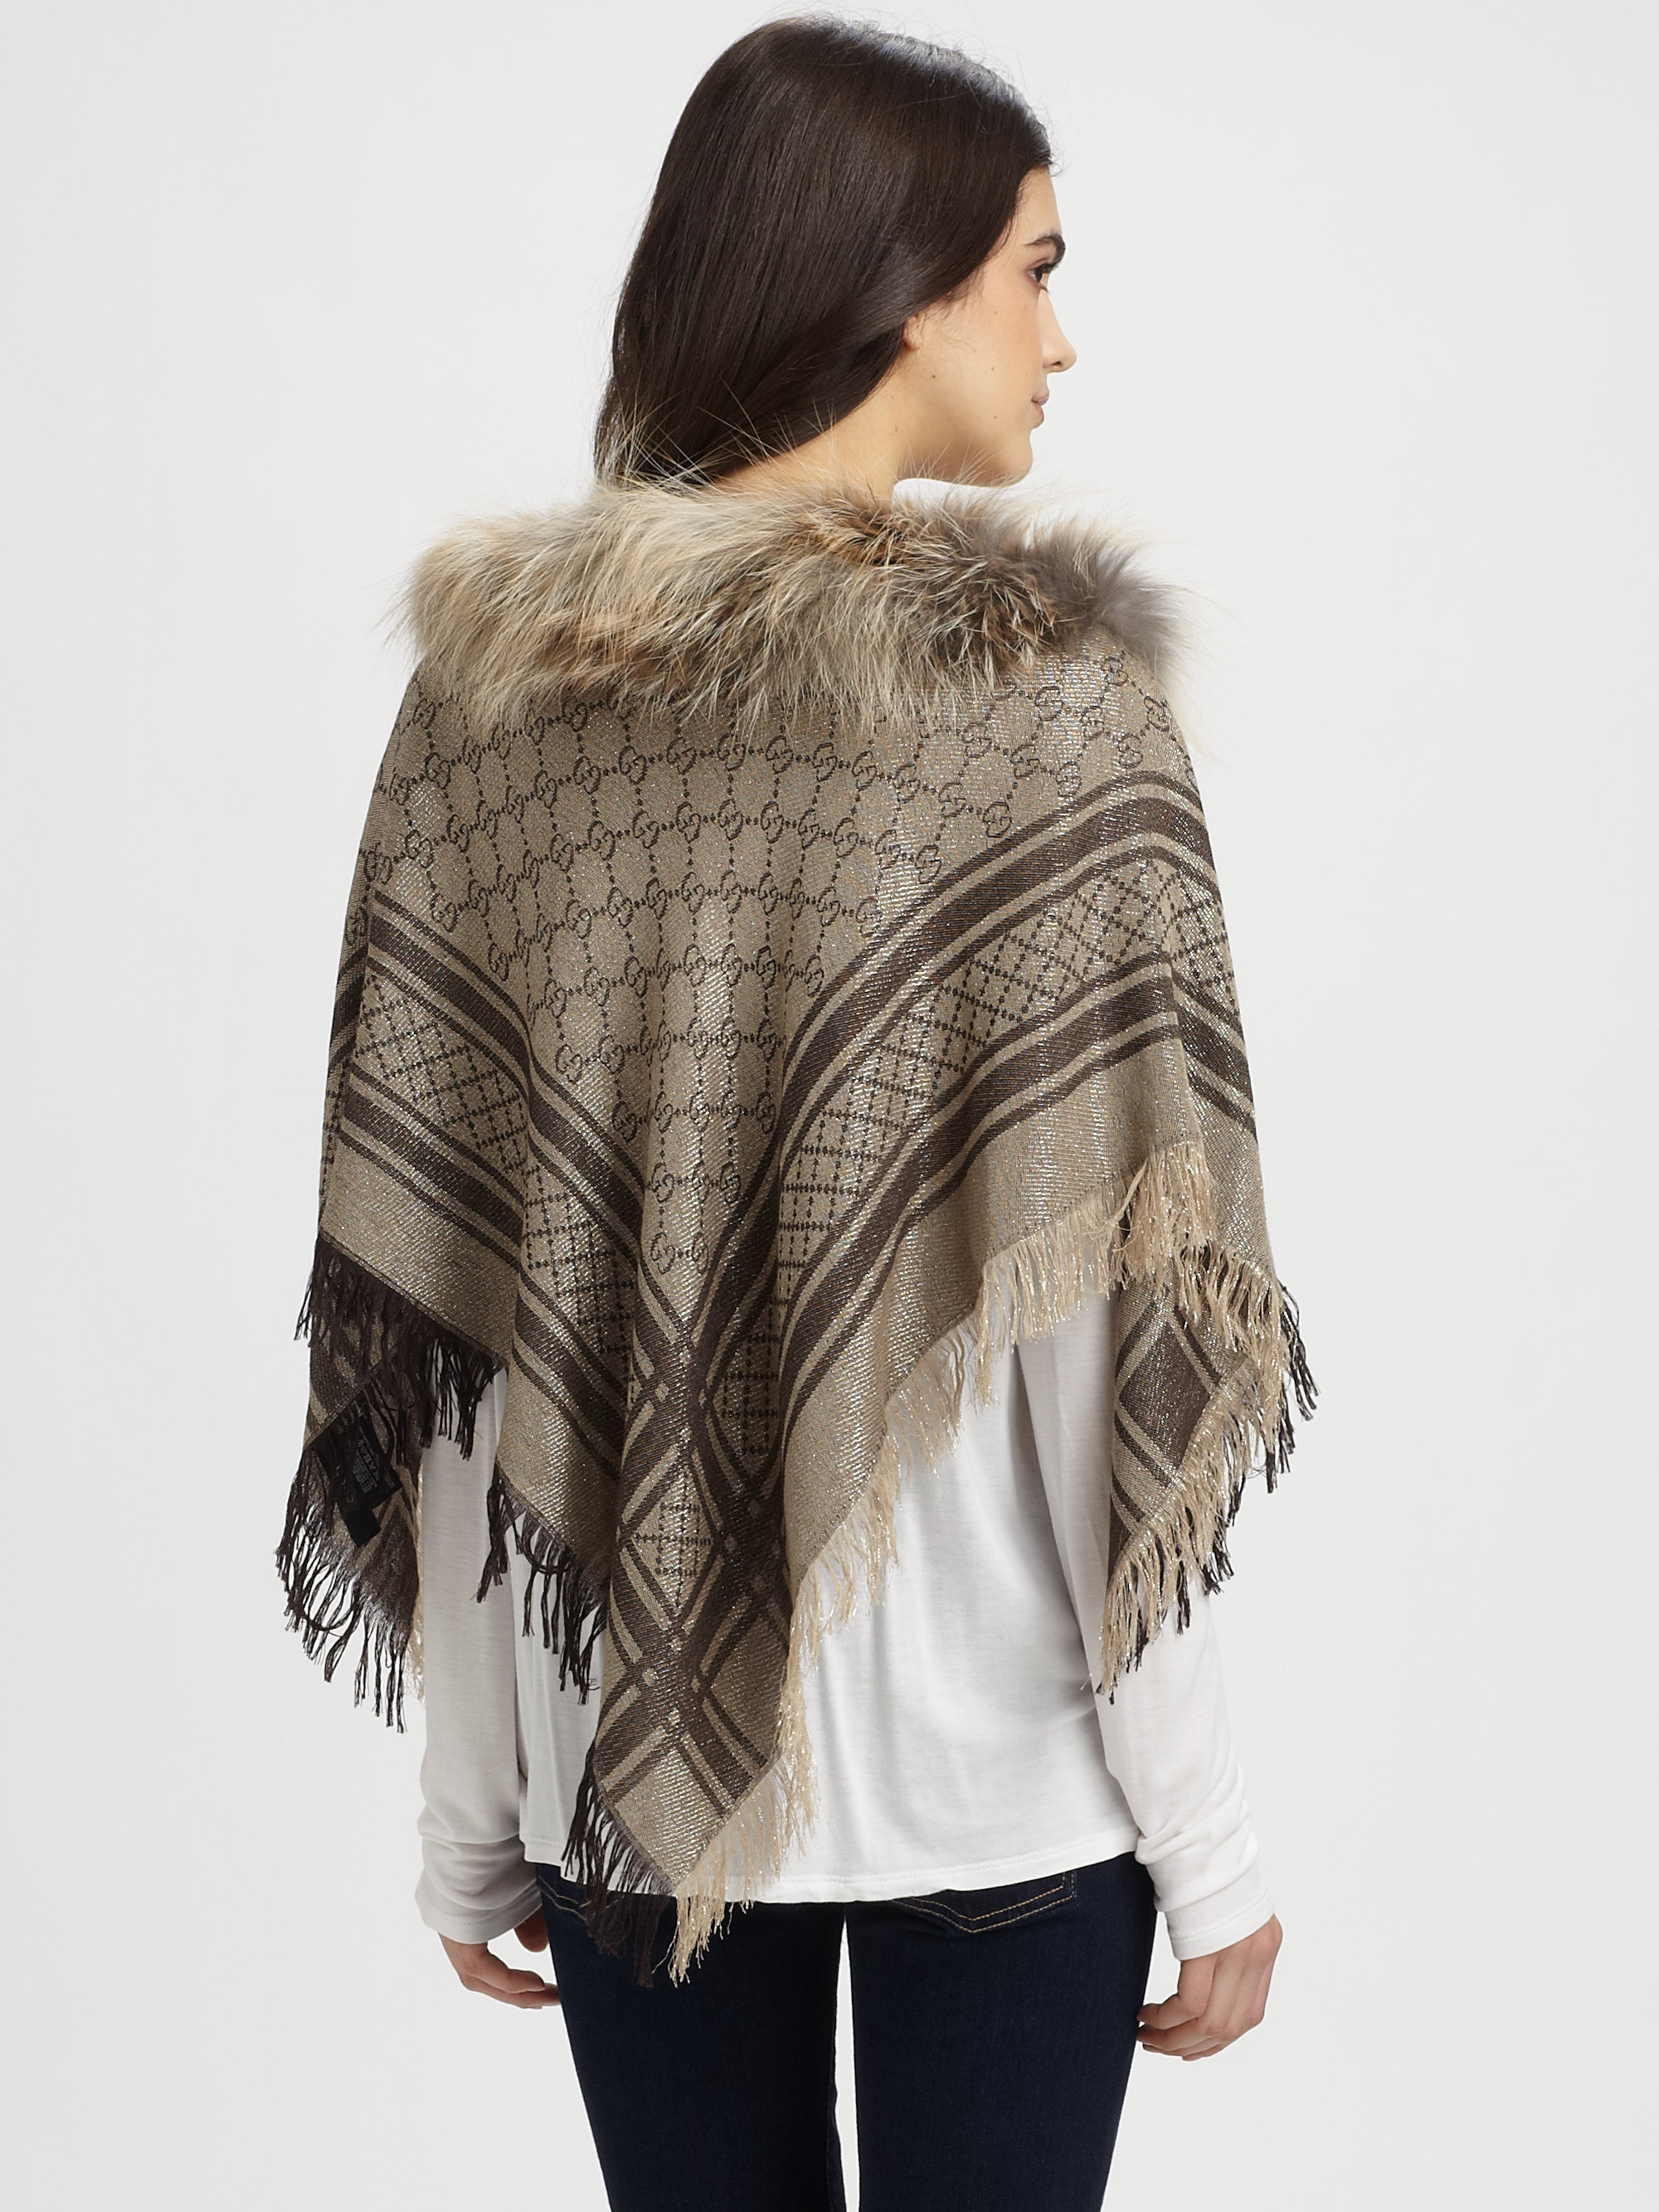 c3f6fe142d5 Lyst - Gucci Fox Fur Miniponce Ponchonatural in Brown